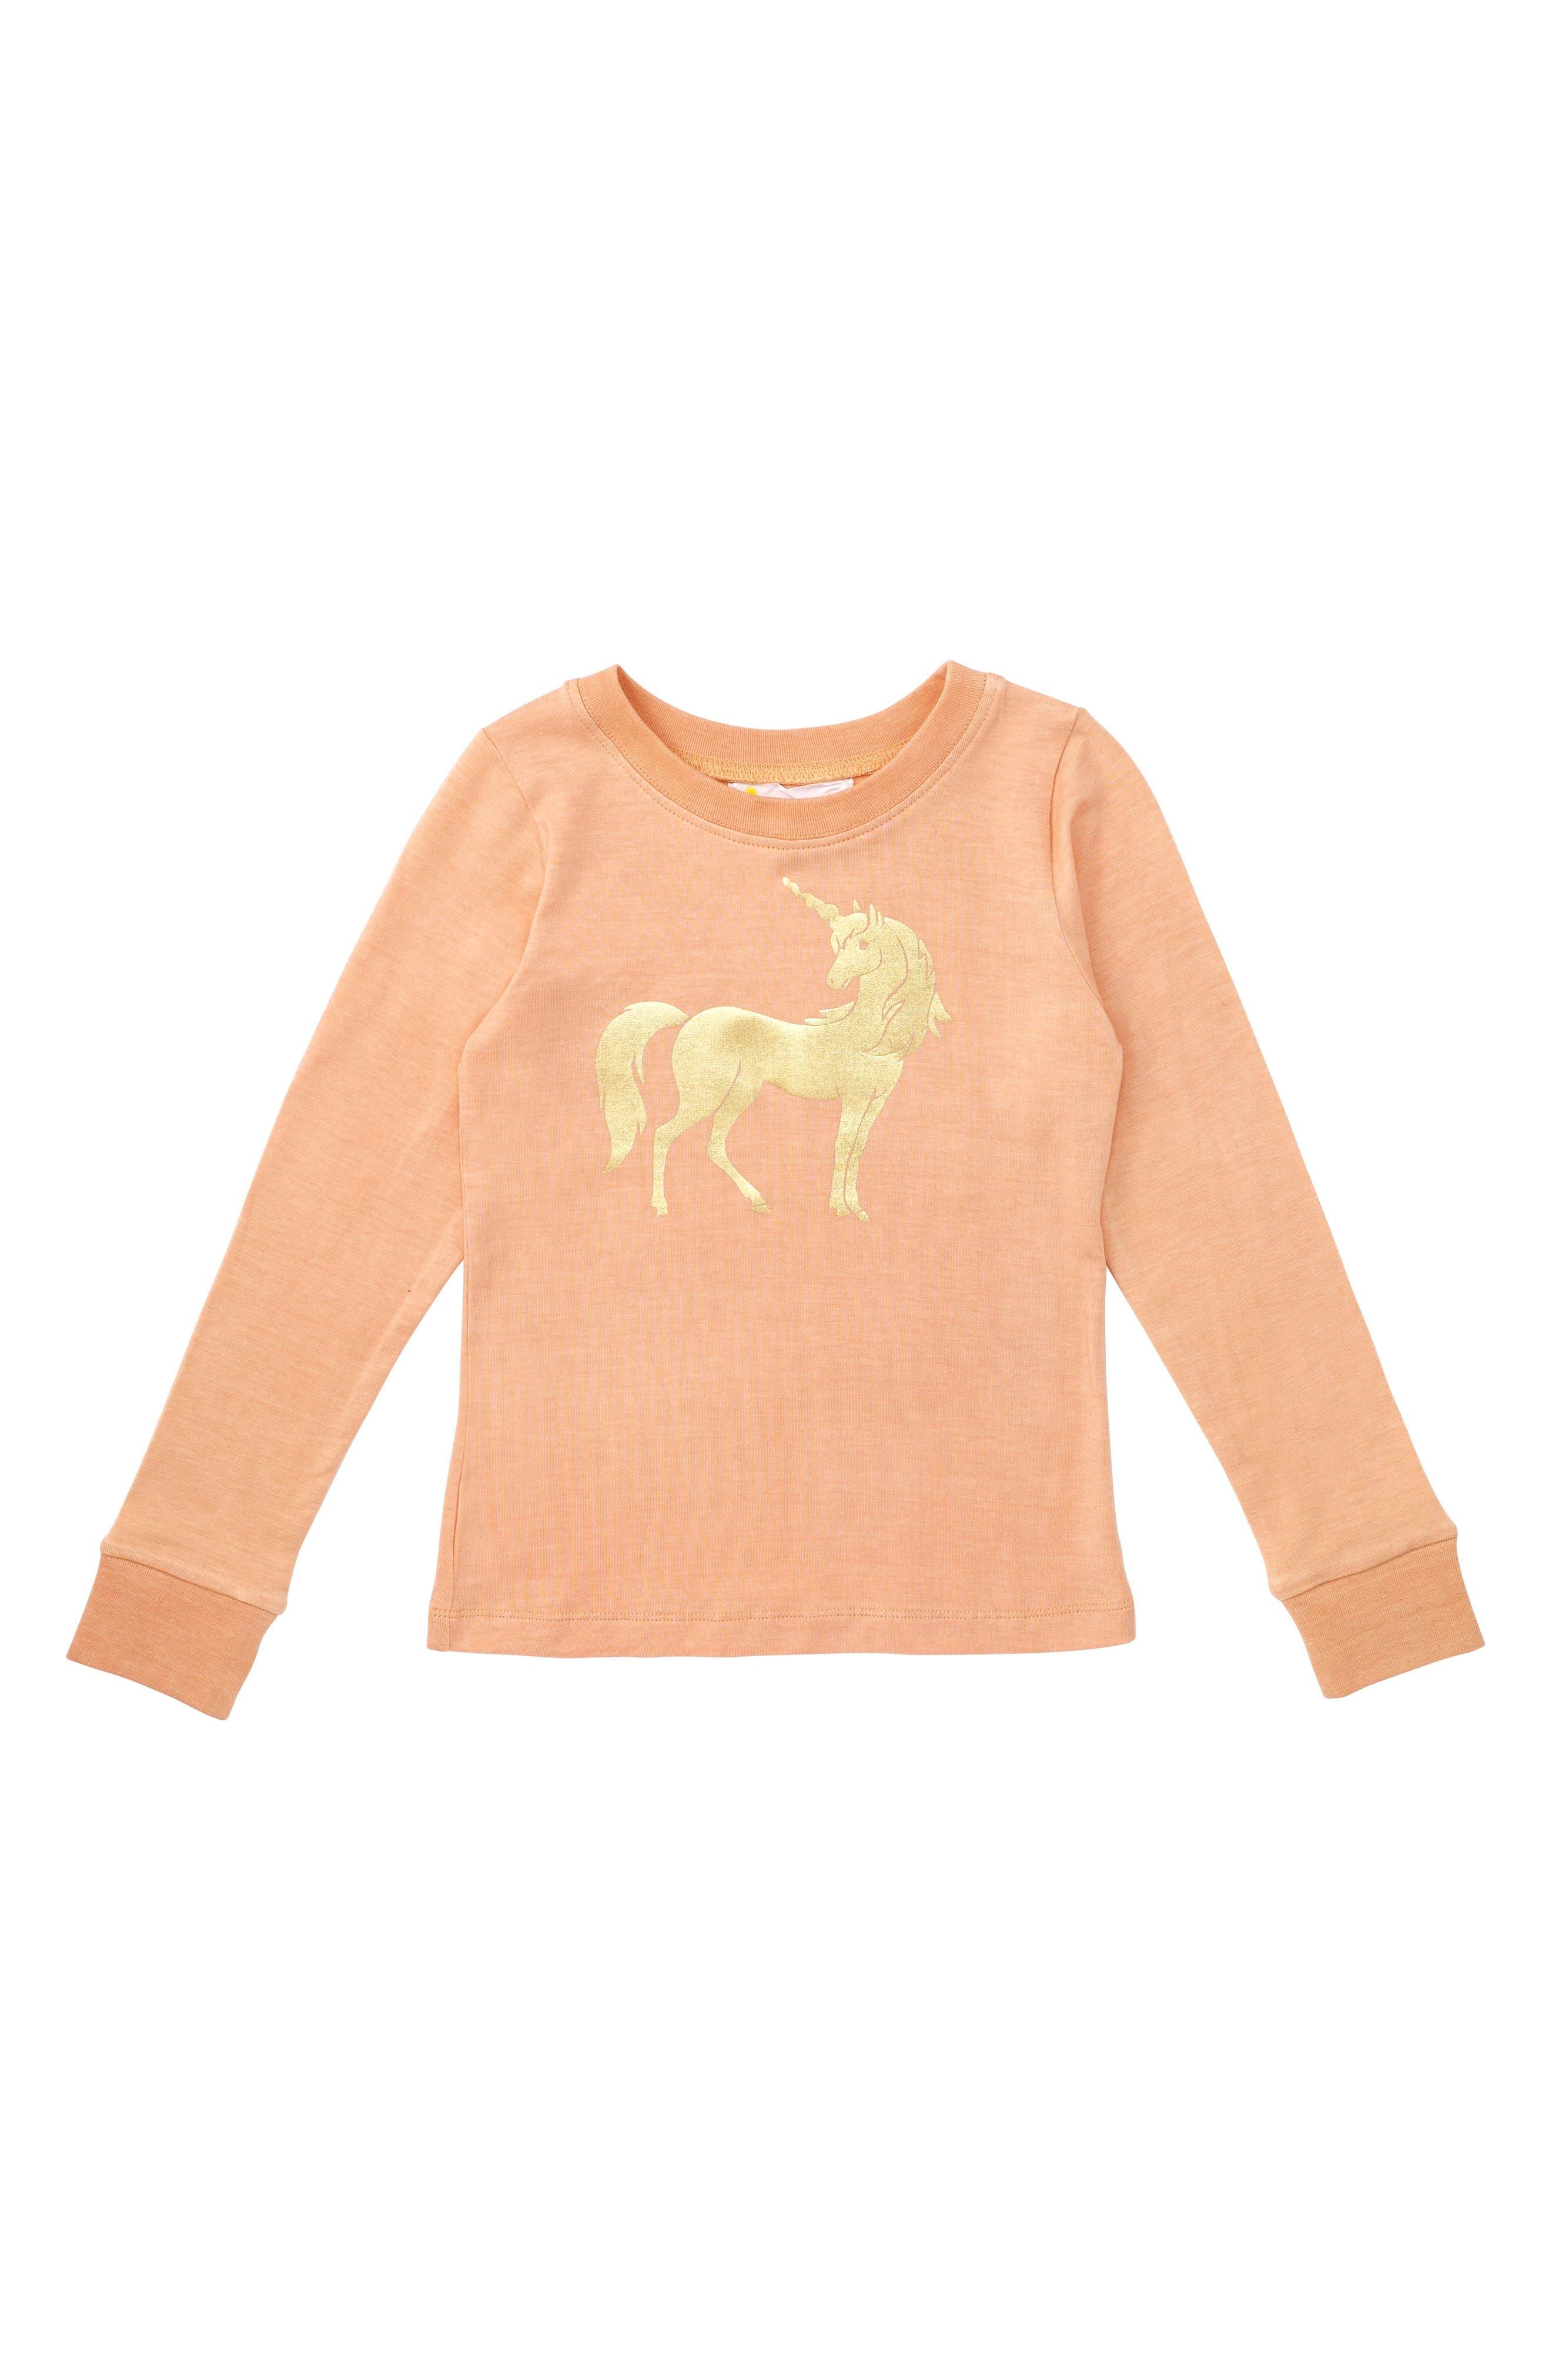 Masalababy Unicorn Graphic Tee (Toddler Girls, Little Girls & Big Girls)